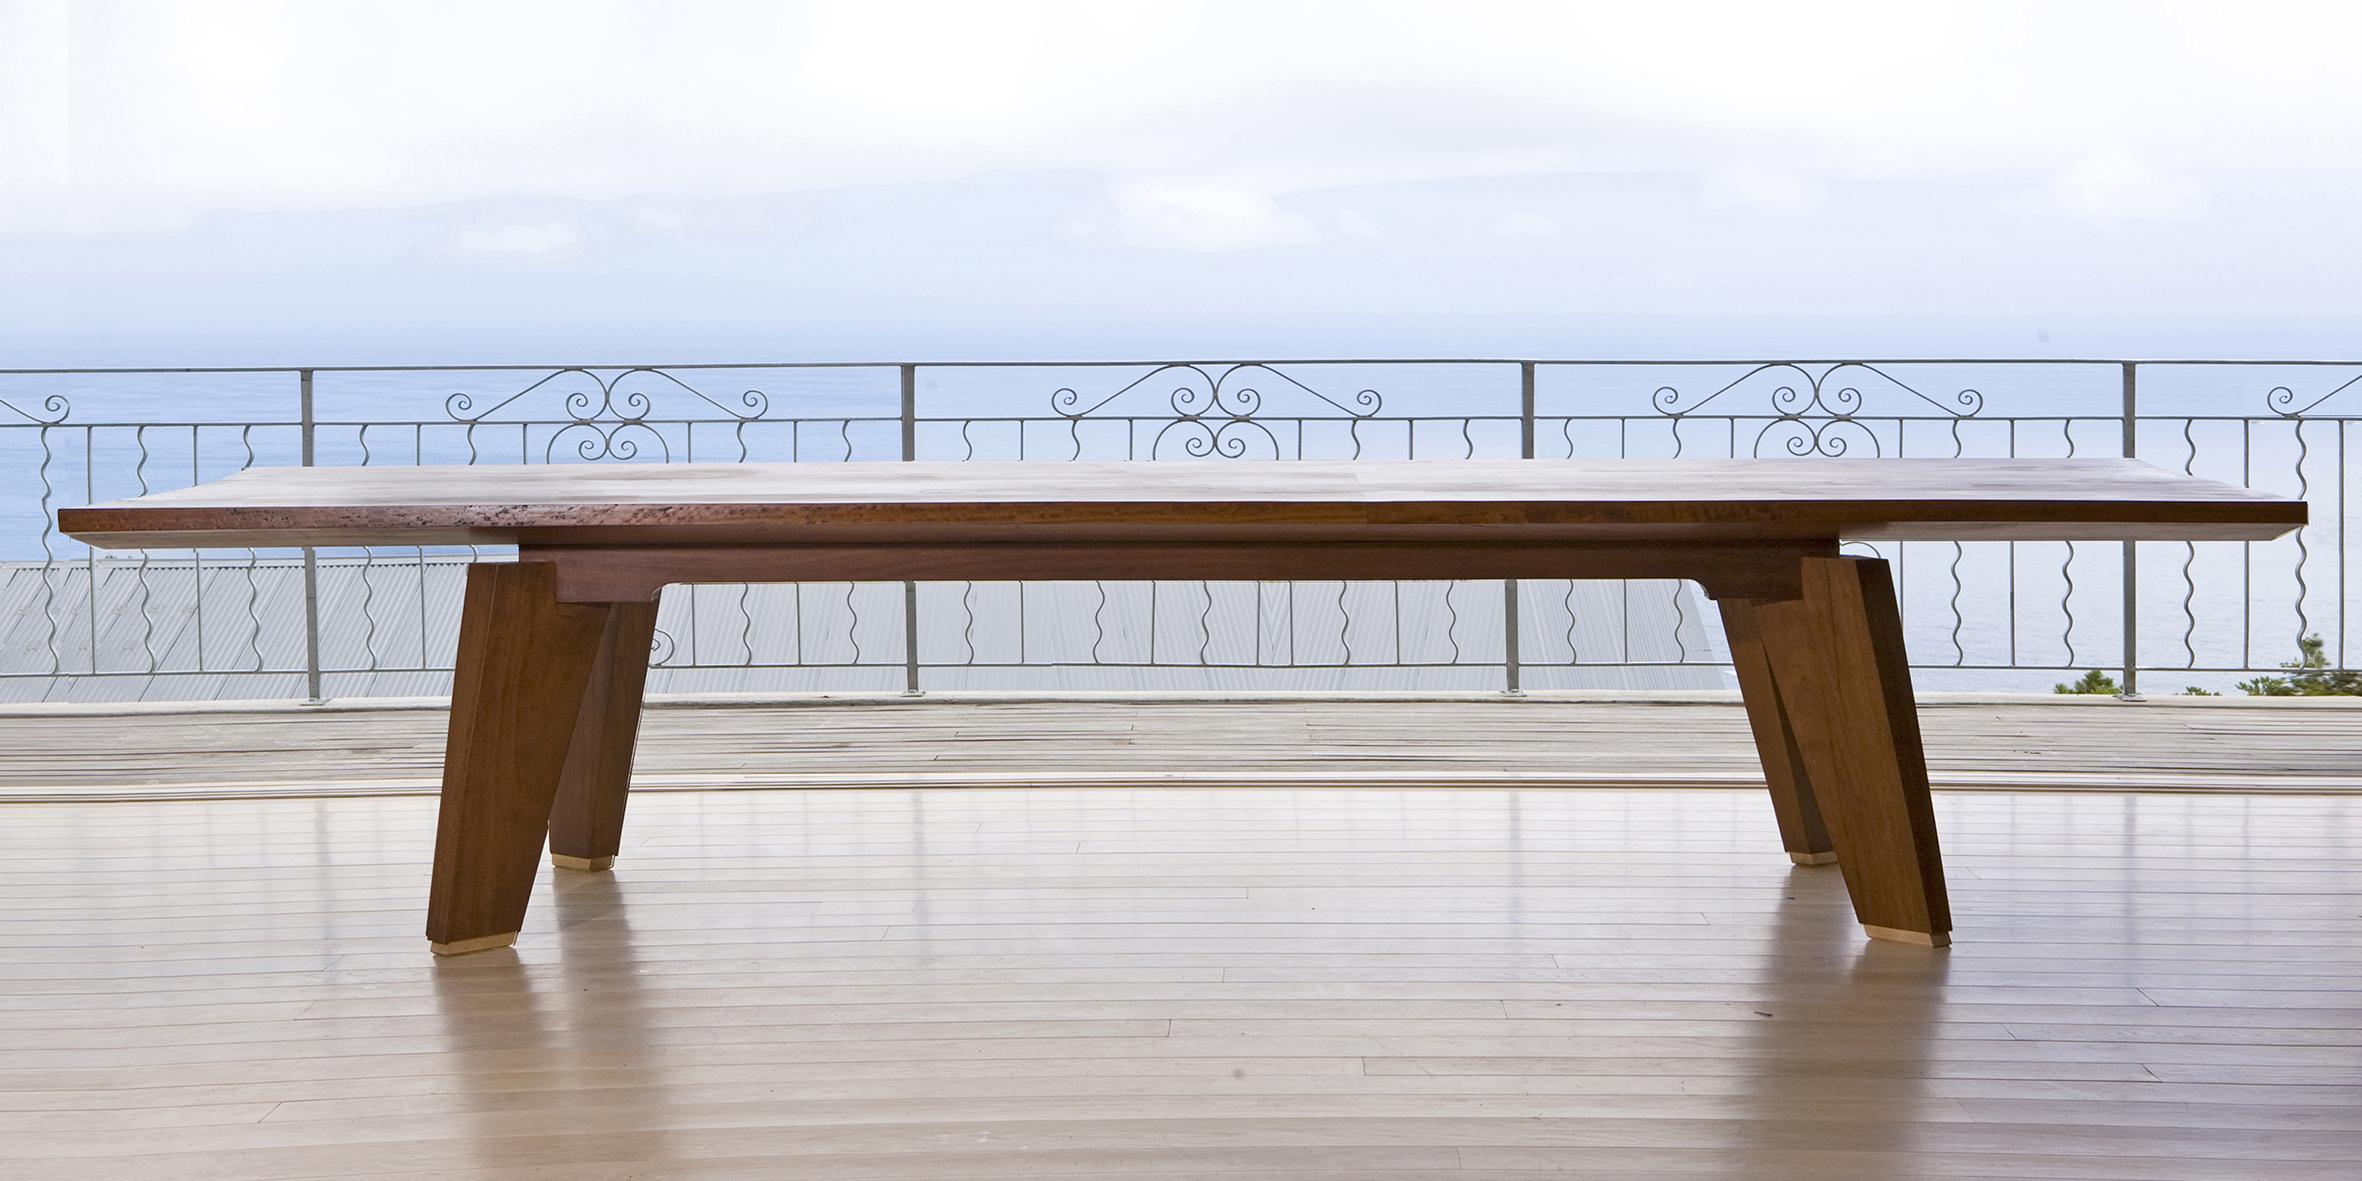 michael table, 2700 l x 1100 w x 730 h, mahogany